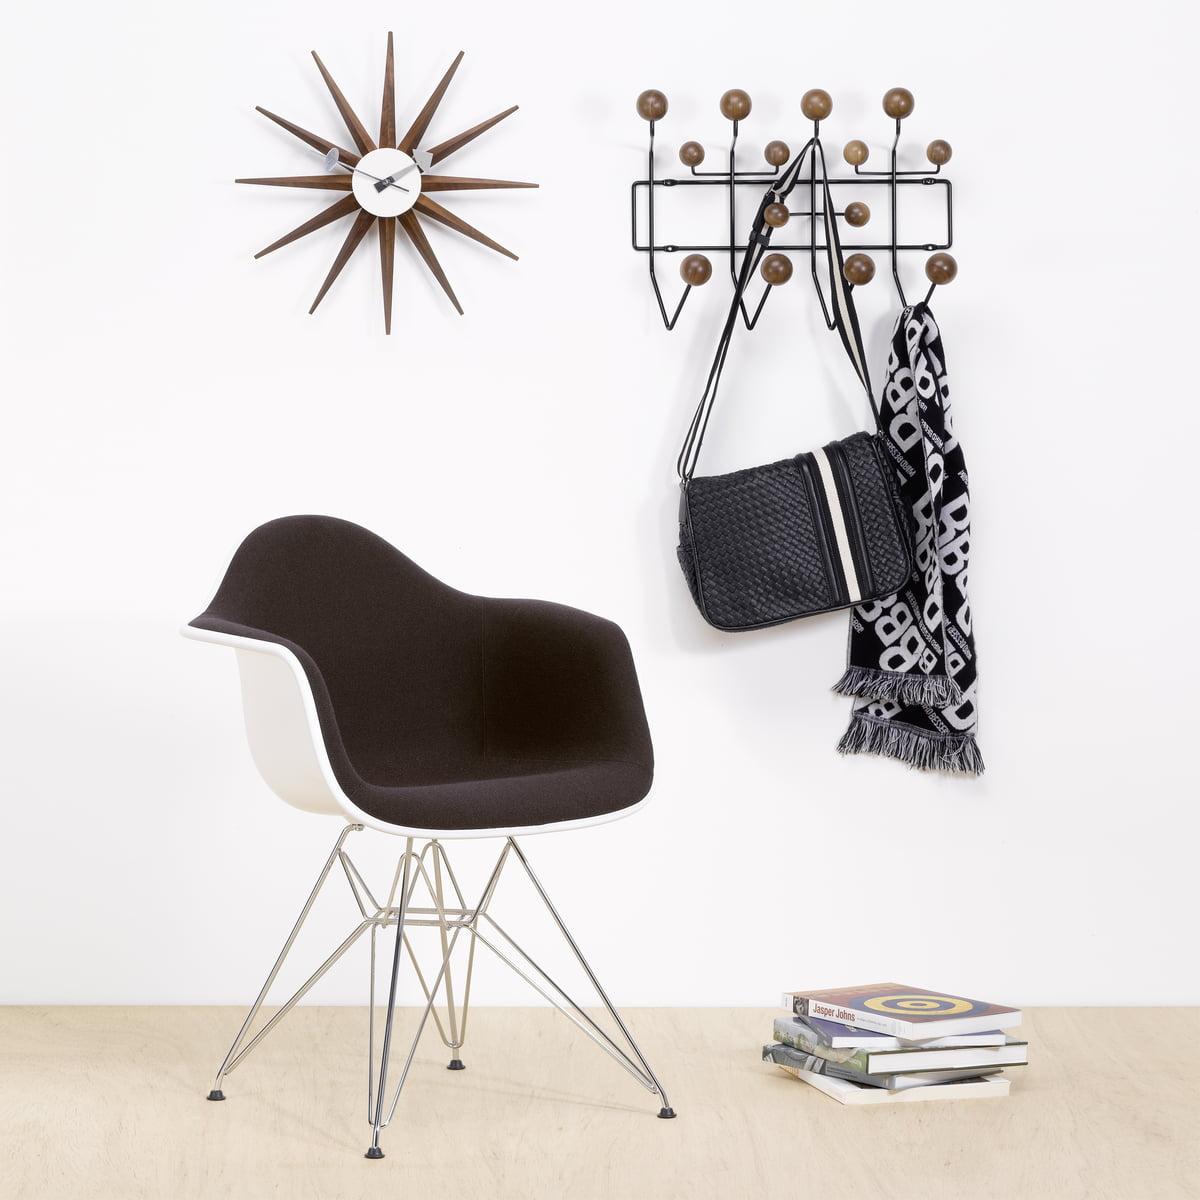 sunburst clock von vitra im shop. Black Bedroom Furniture Sets. Home Design Ideas